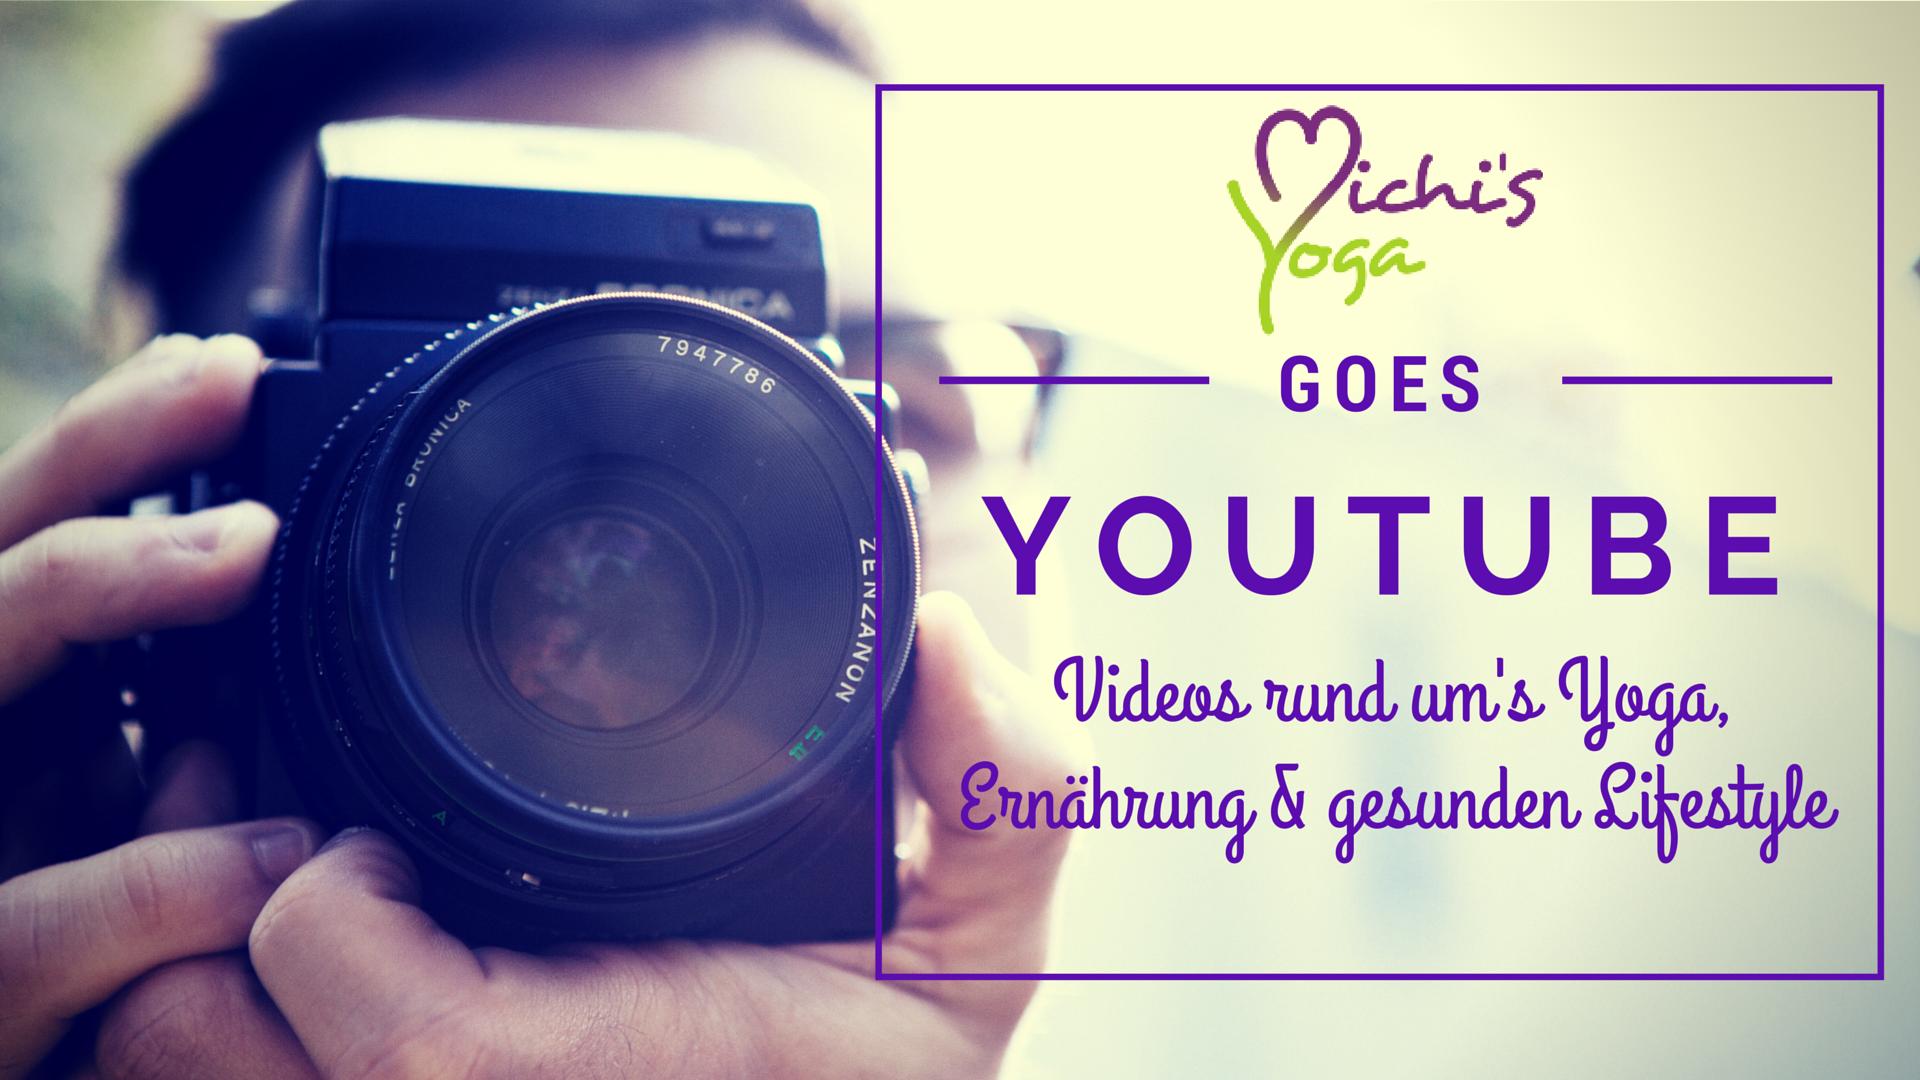 Michi's Yoga goes YOUTUBE!